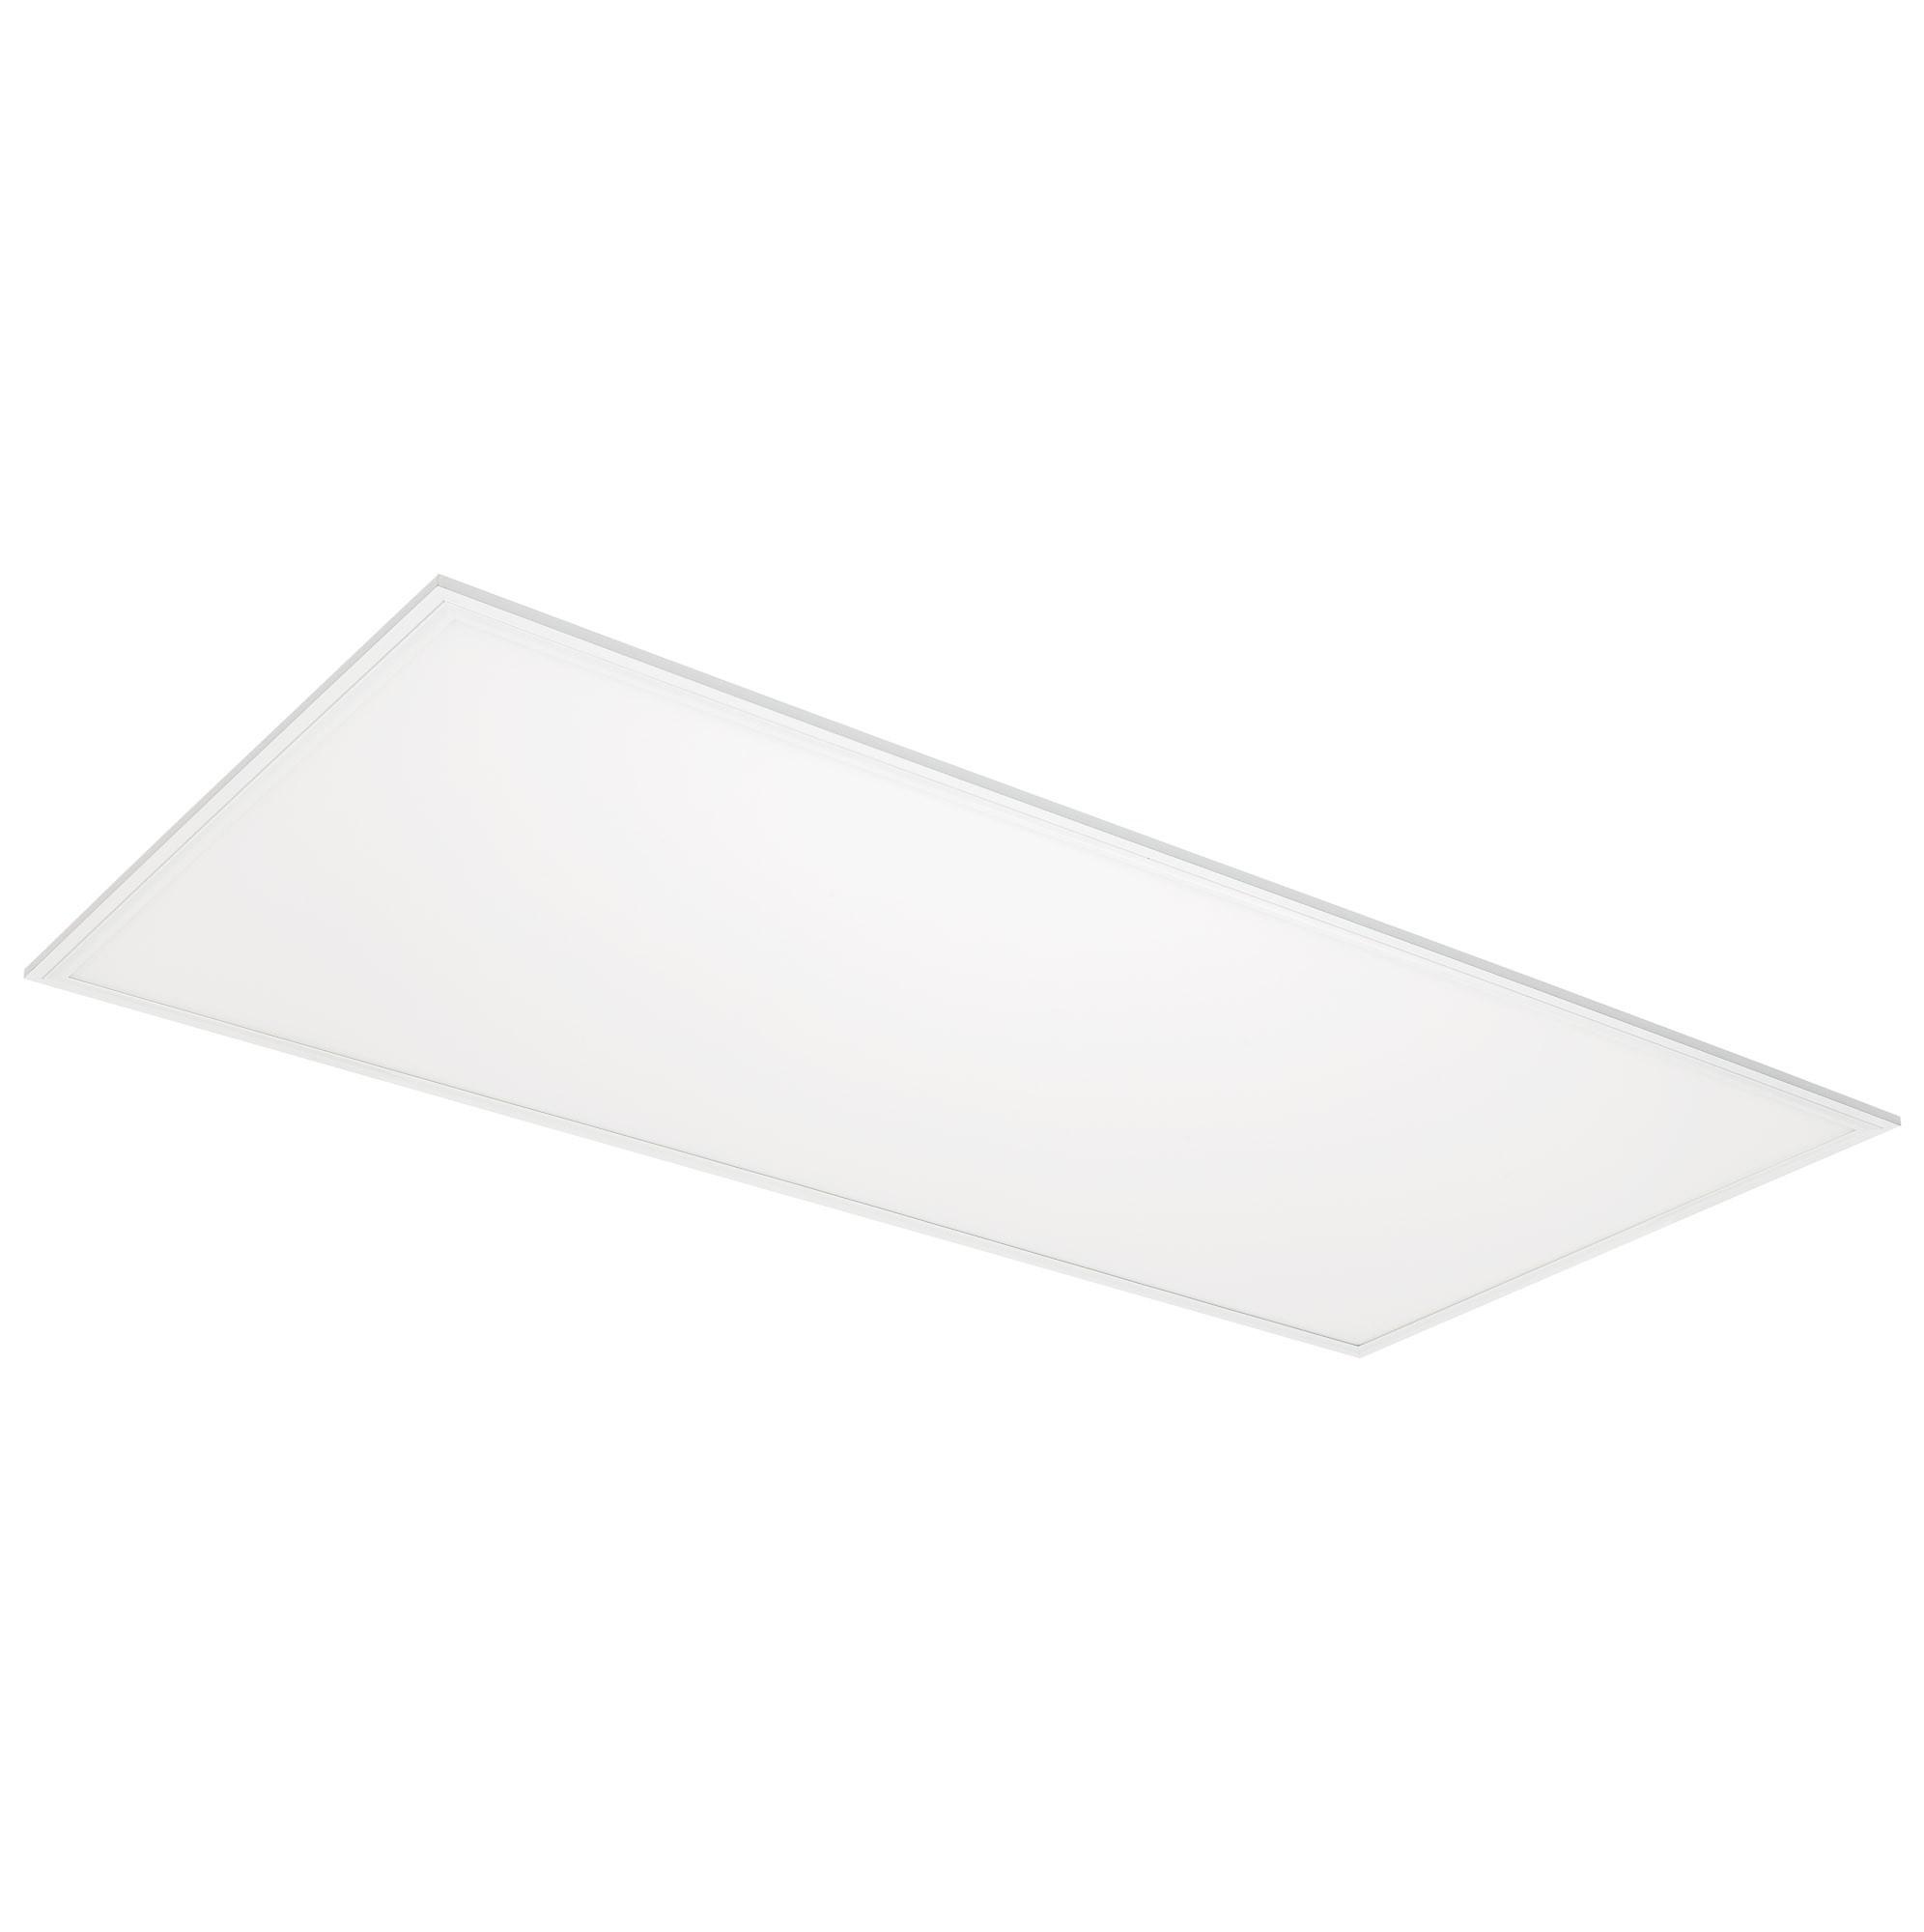 LED LIGHT PANEL - 72W - 1200mm X 600mm - 6000K